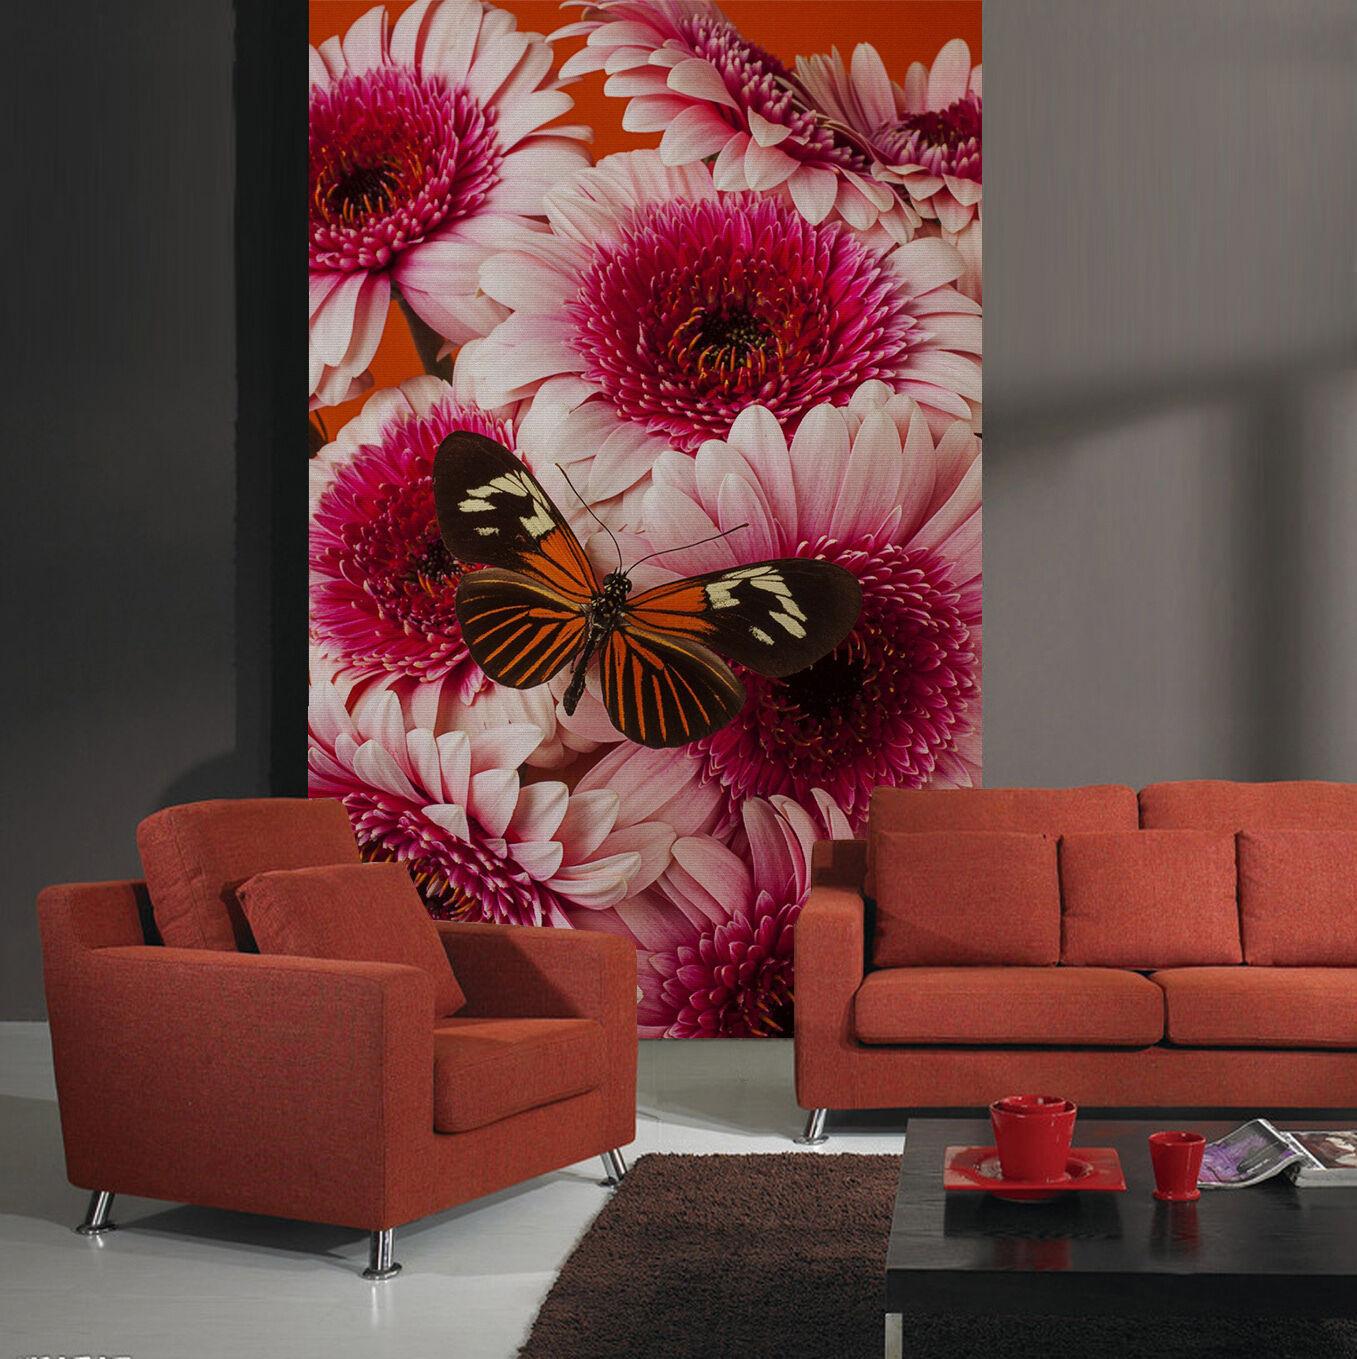 3D Flowers Butterfly 02 WallPaper Murals Wall Print Decal Wall Deco AJ WALLPAPER